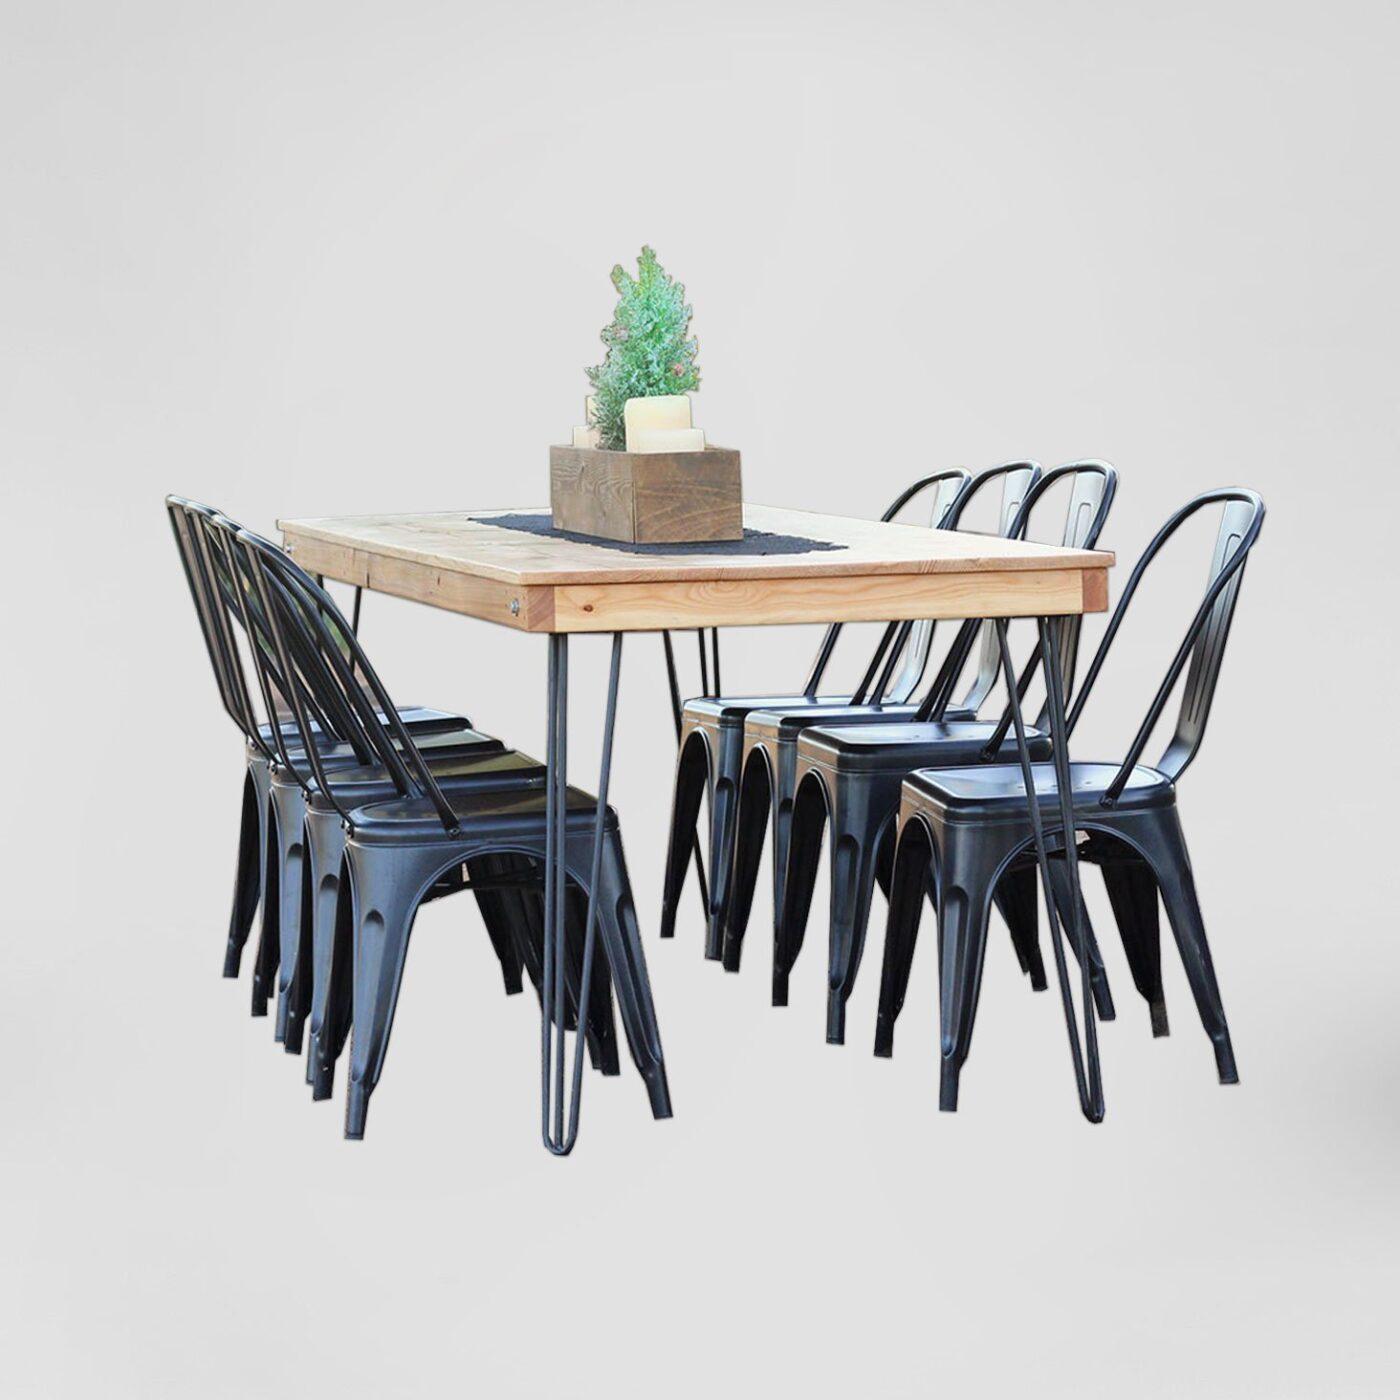 Honey Wood Farm Table Rentals San Diego Light Wood Table